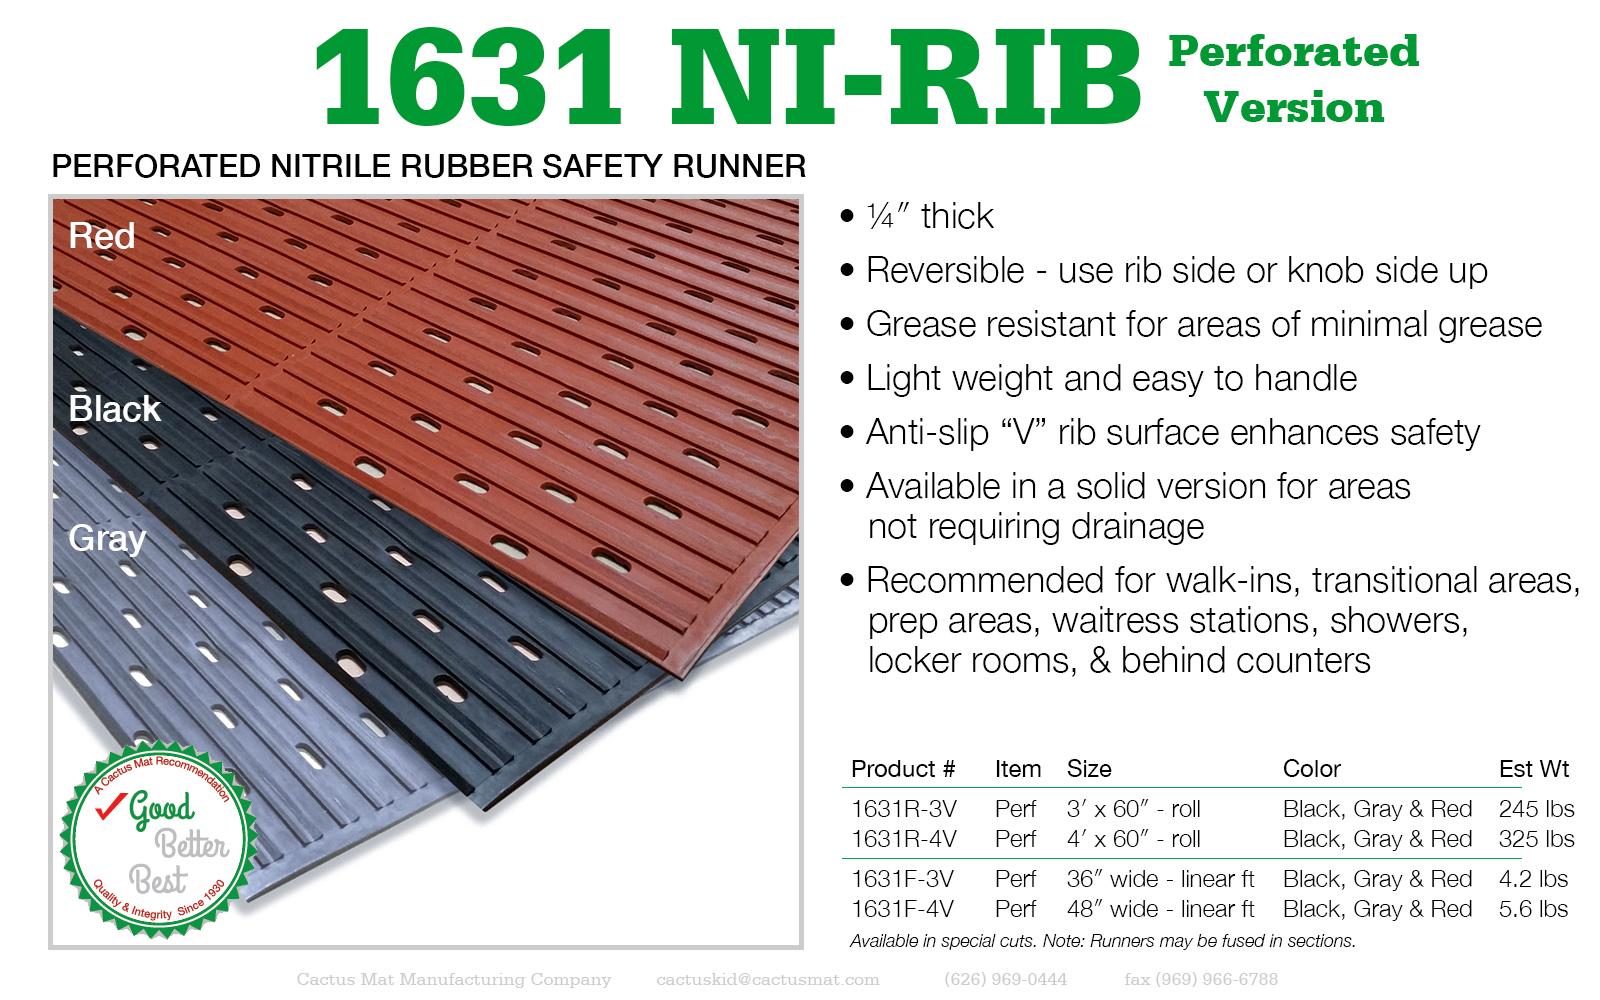 1631_Ni-Rib_Perforated_1600x1000.jpg